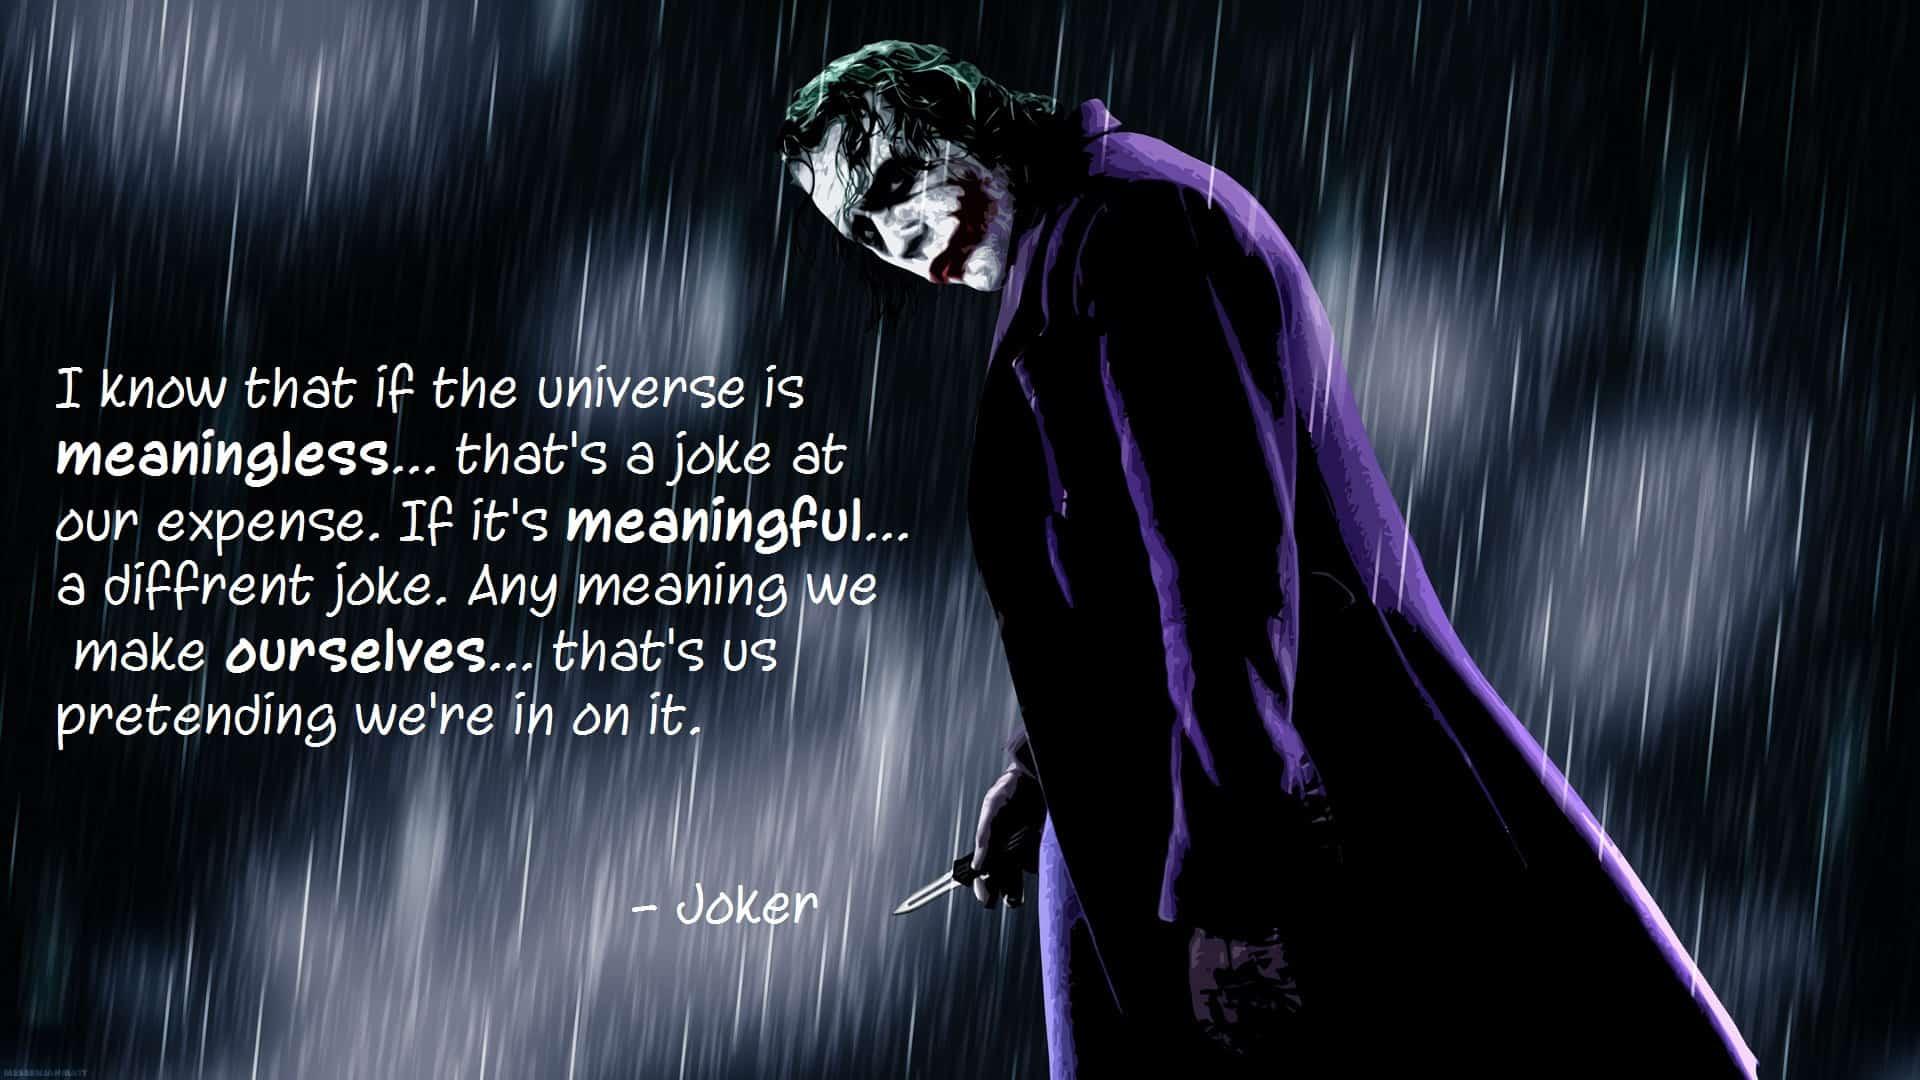 joker quotes 2